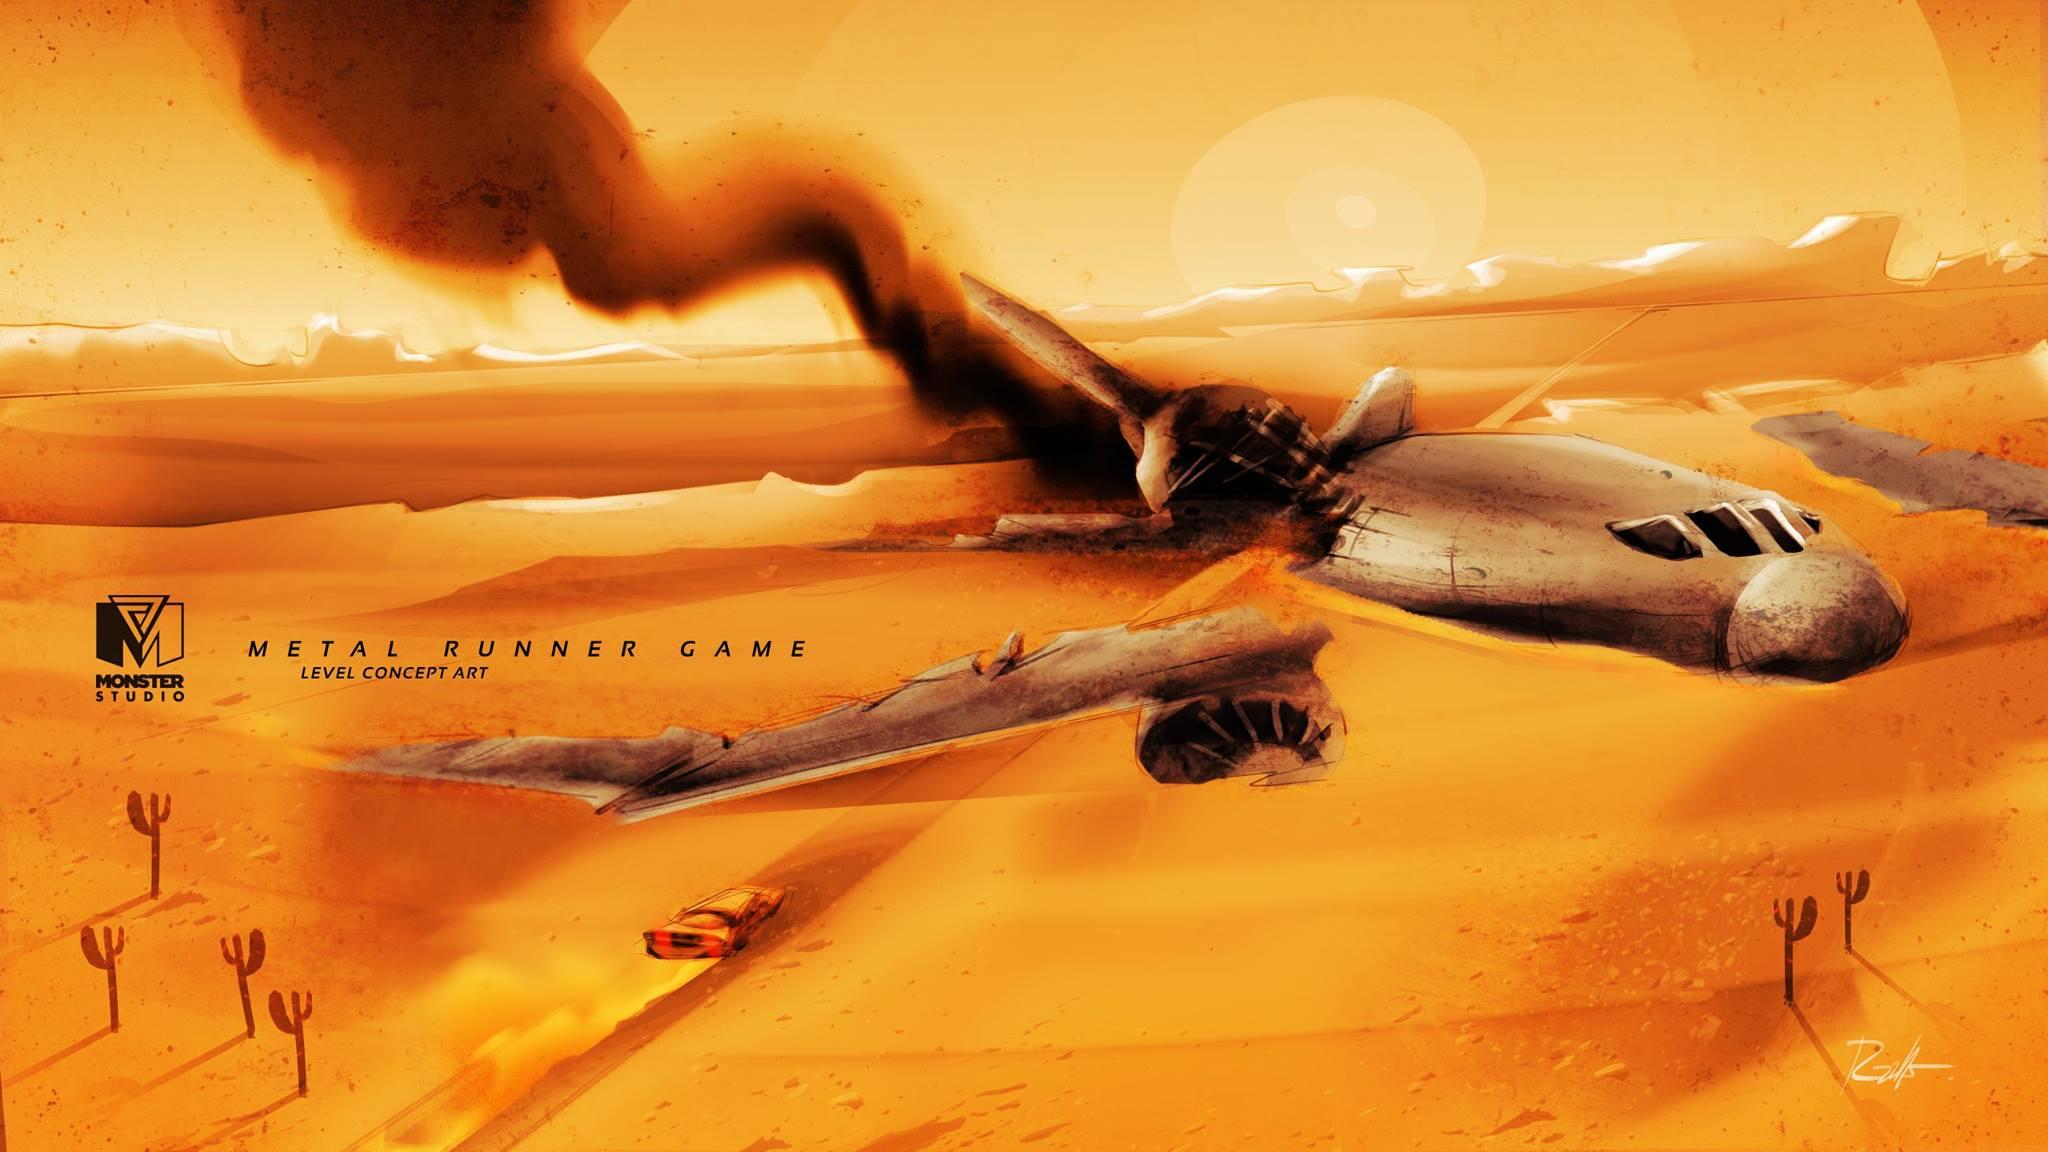 Airplane - Level Concept Art